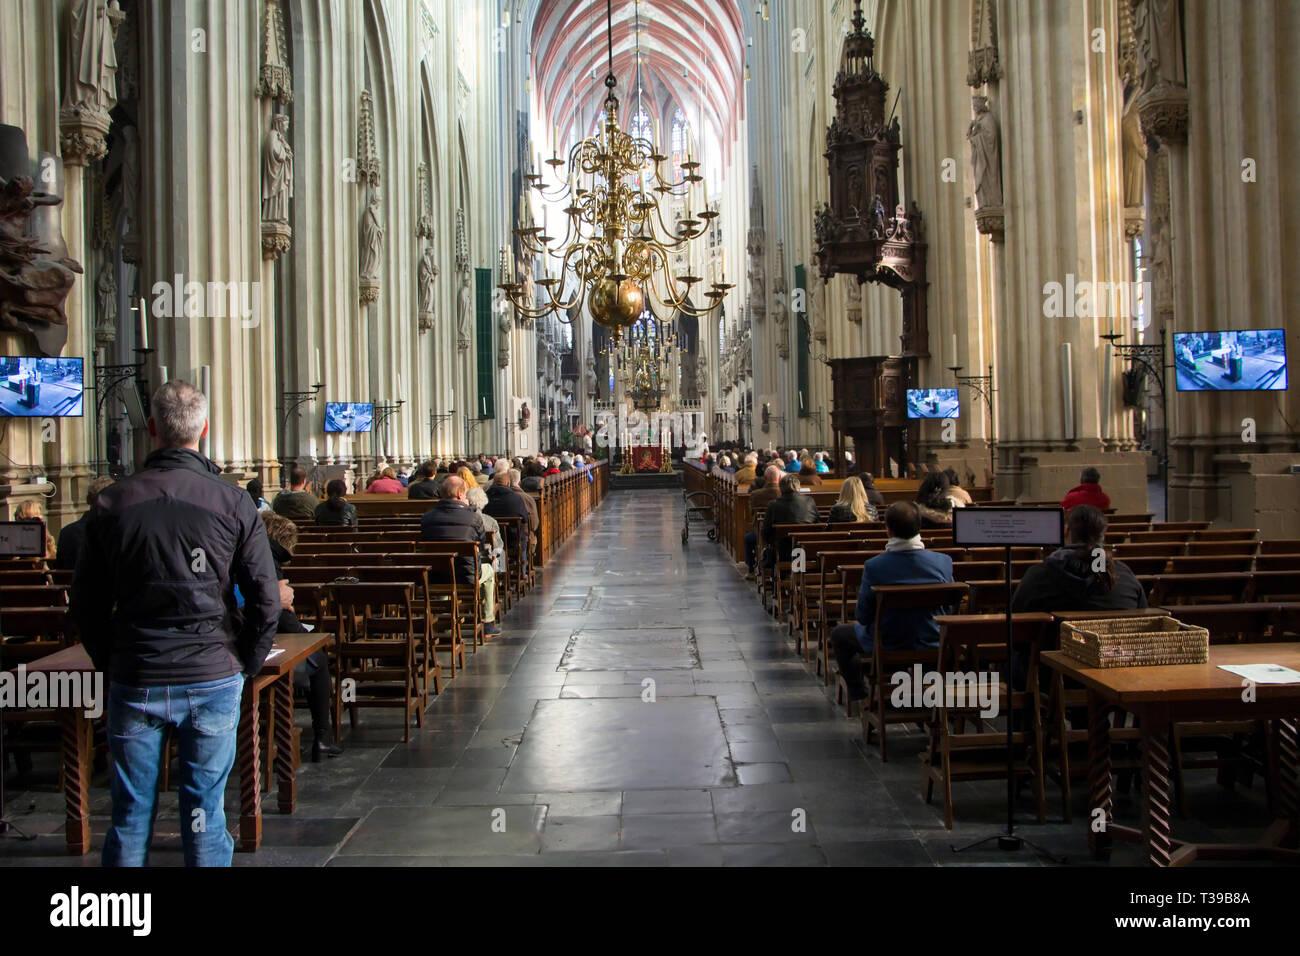 Saint John's Cathedral. Sint Janskathedraal. Netherlands, Hertogenbosch, also known as Den Bosch. The Gothic church. - Stock Image